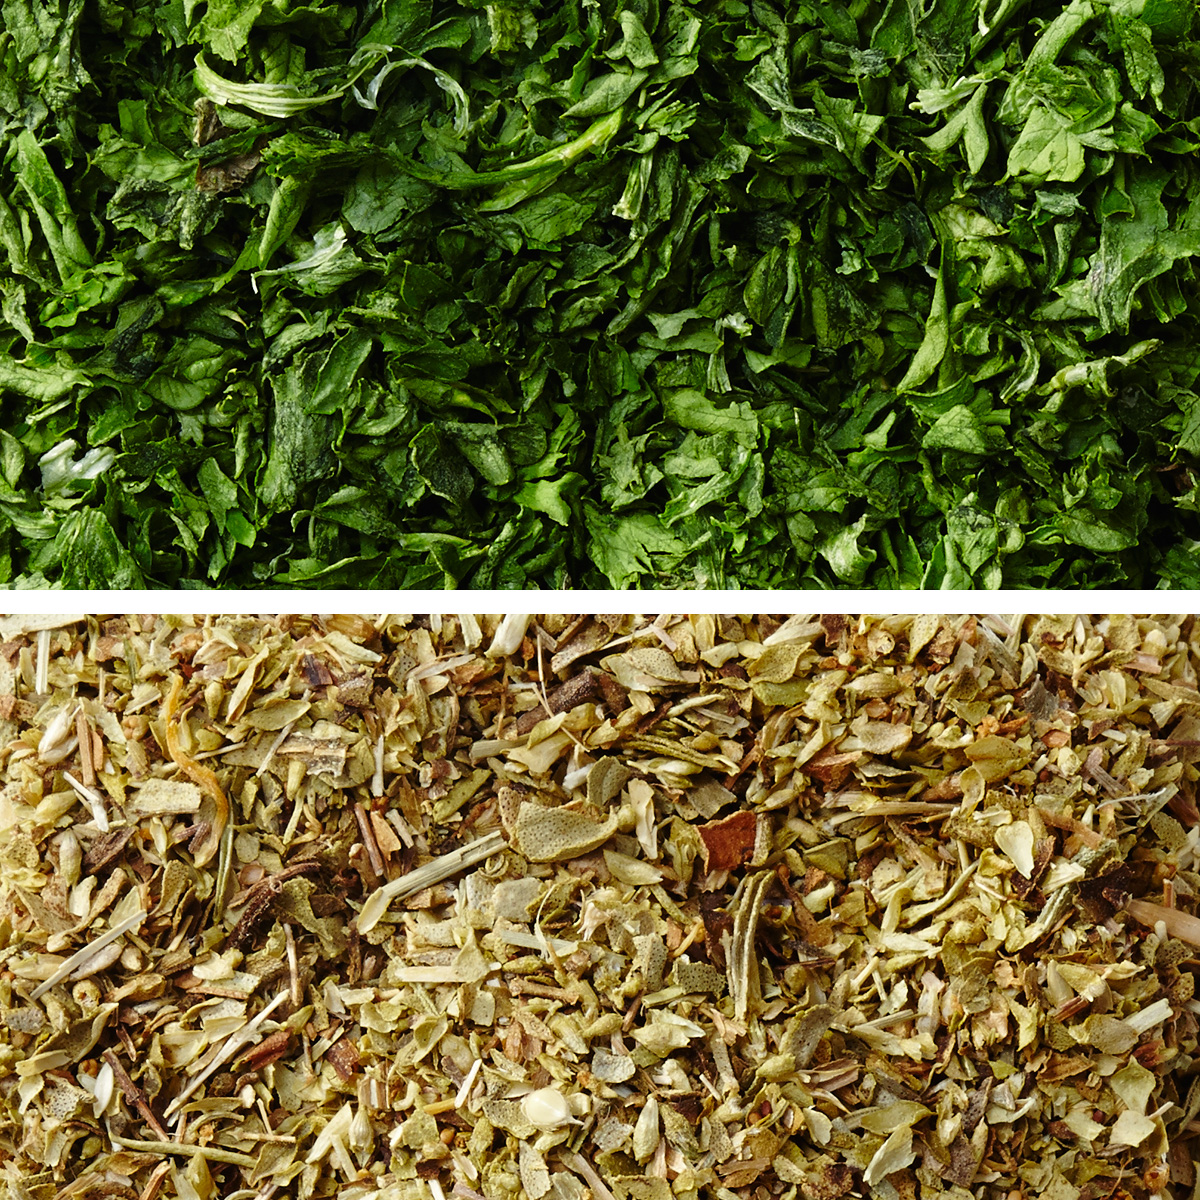 oregano and parsley dried herbs